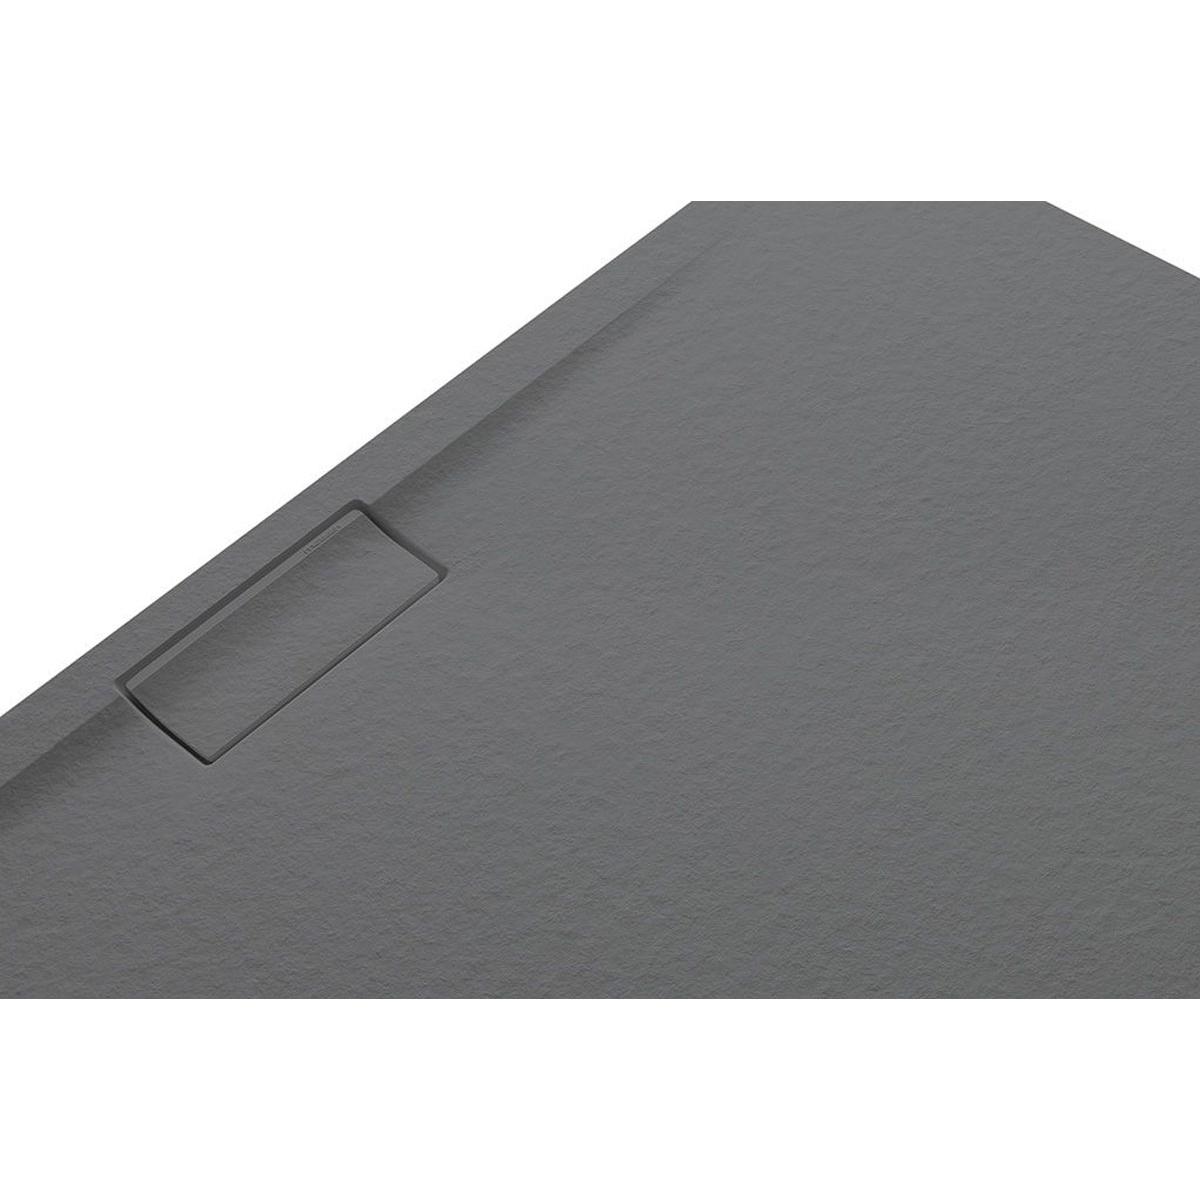 Plato de ducha rectangular 120x80 Nova Stone Cover Cemento